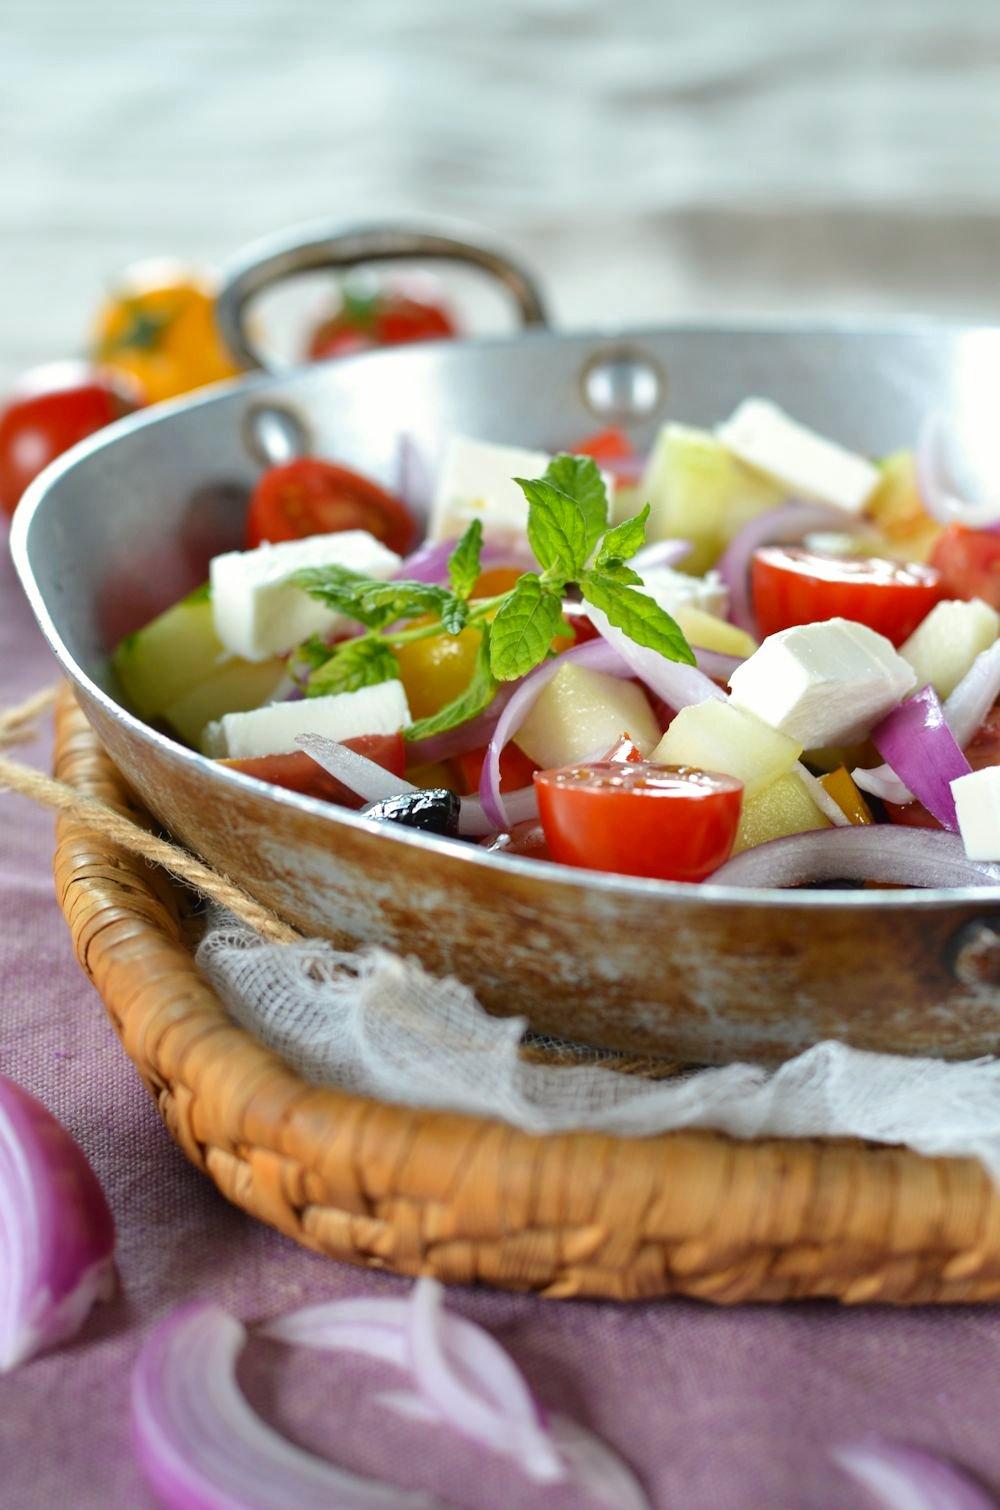 salade la grecque maison recette tangerine zest. Black Bedroom Furniture Sets. Home Design Ideas